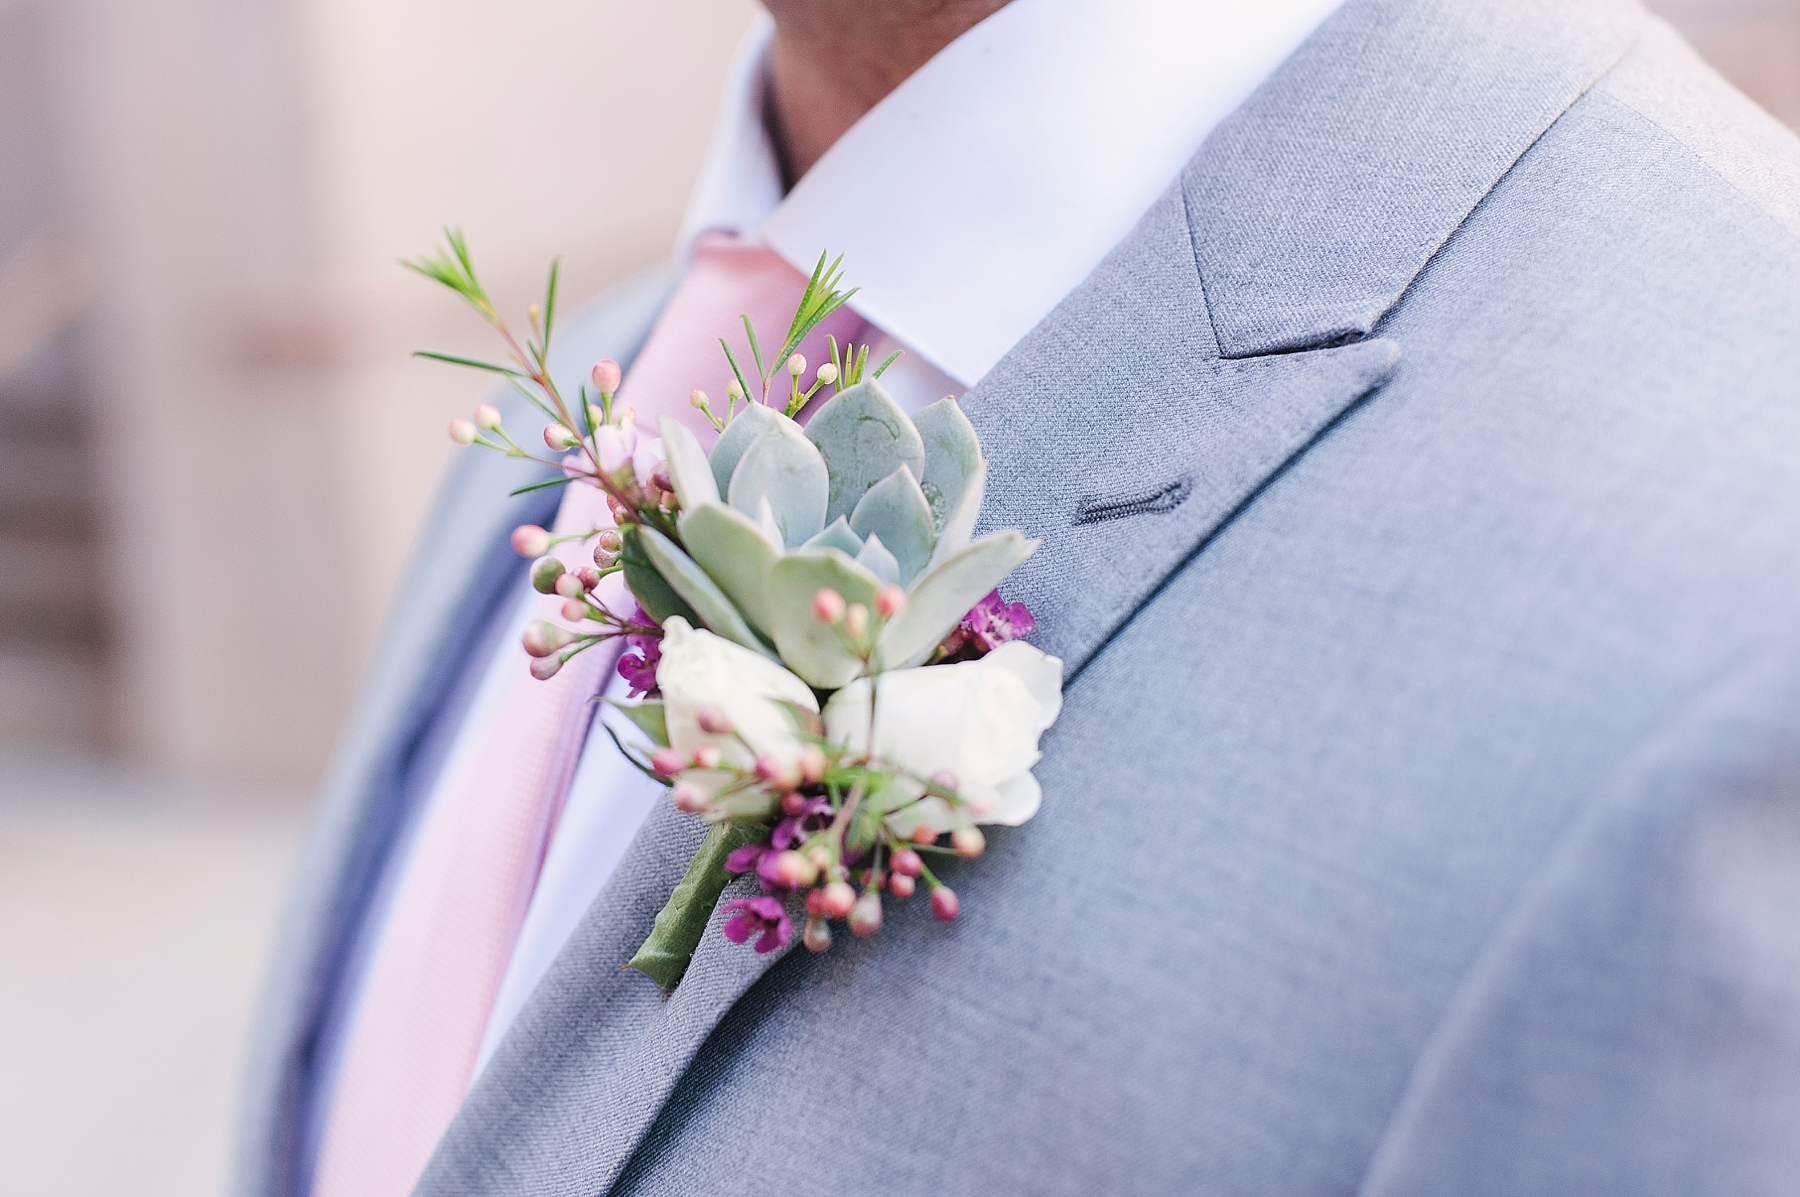 springs-preserve-wedding-las-vegas-destination-photography-the-emerics-10.jpg